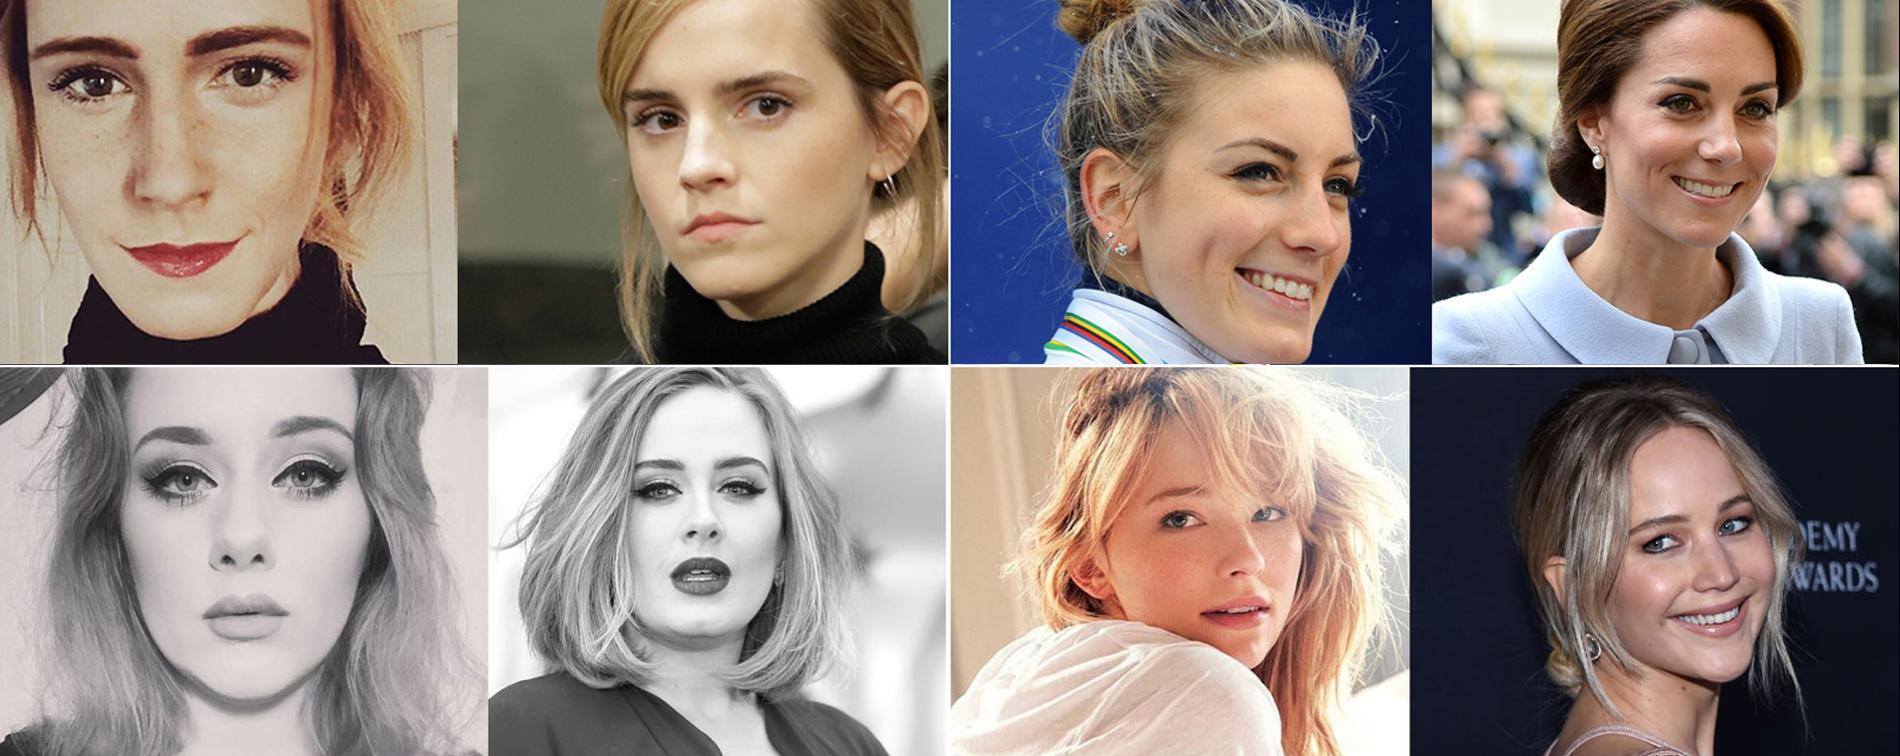 Kate Middleton, Emma Watson, Jennifer Lawrence... Les meilleurs sosies des stars